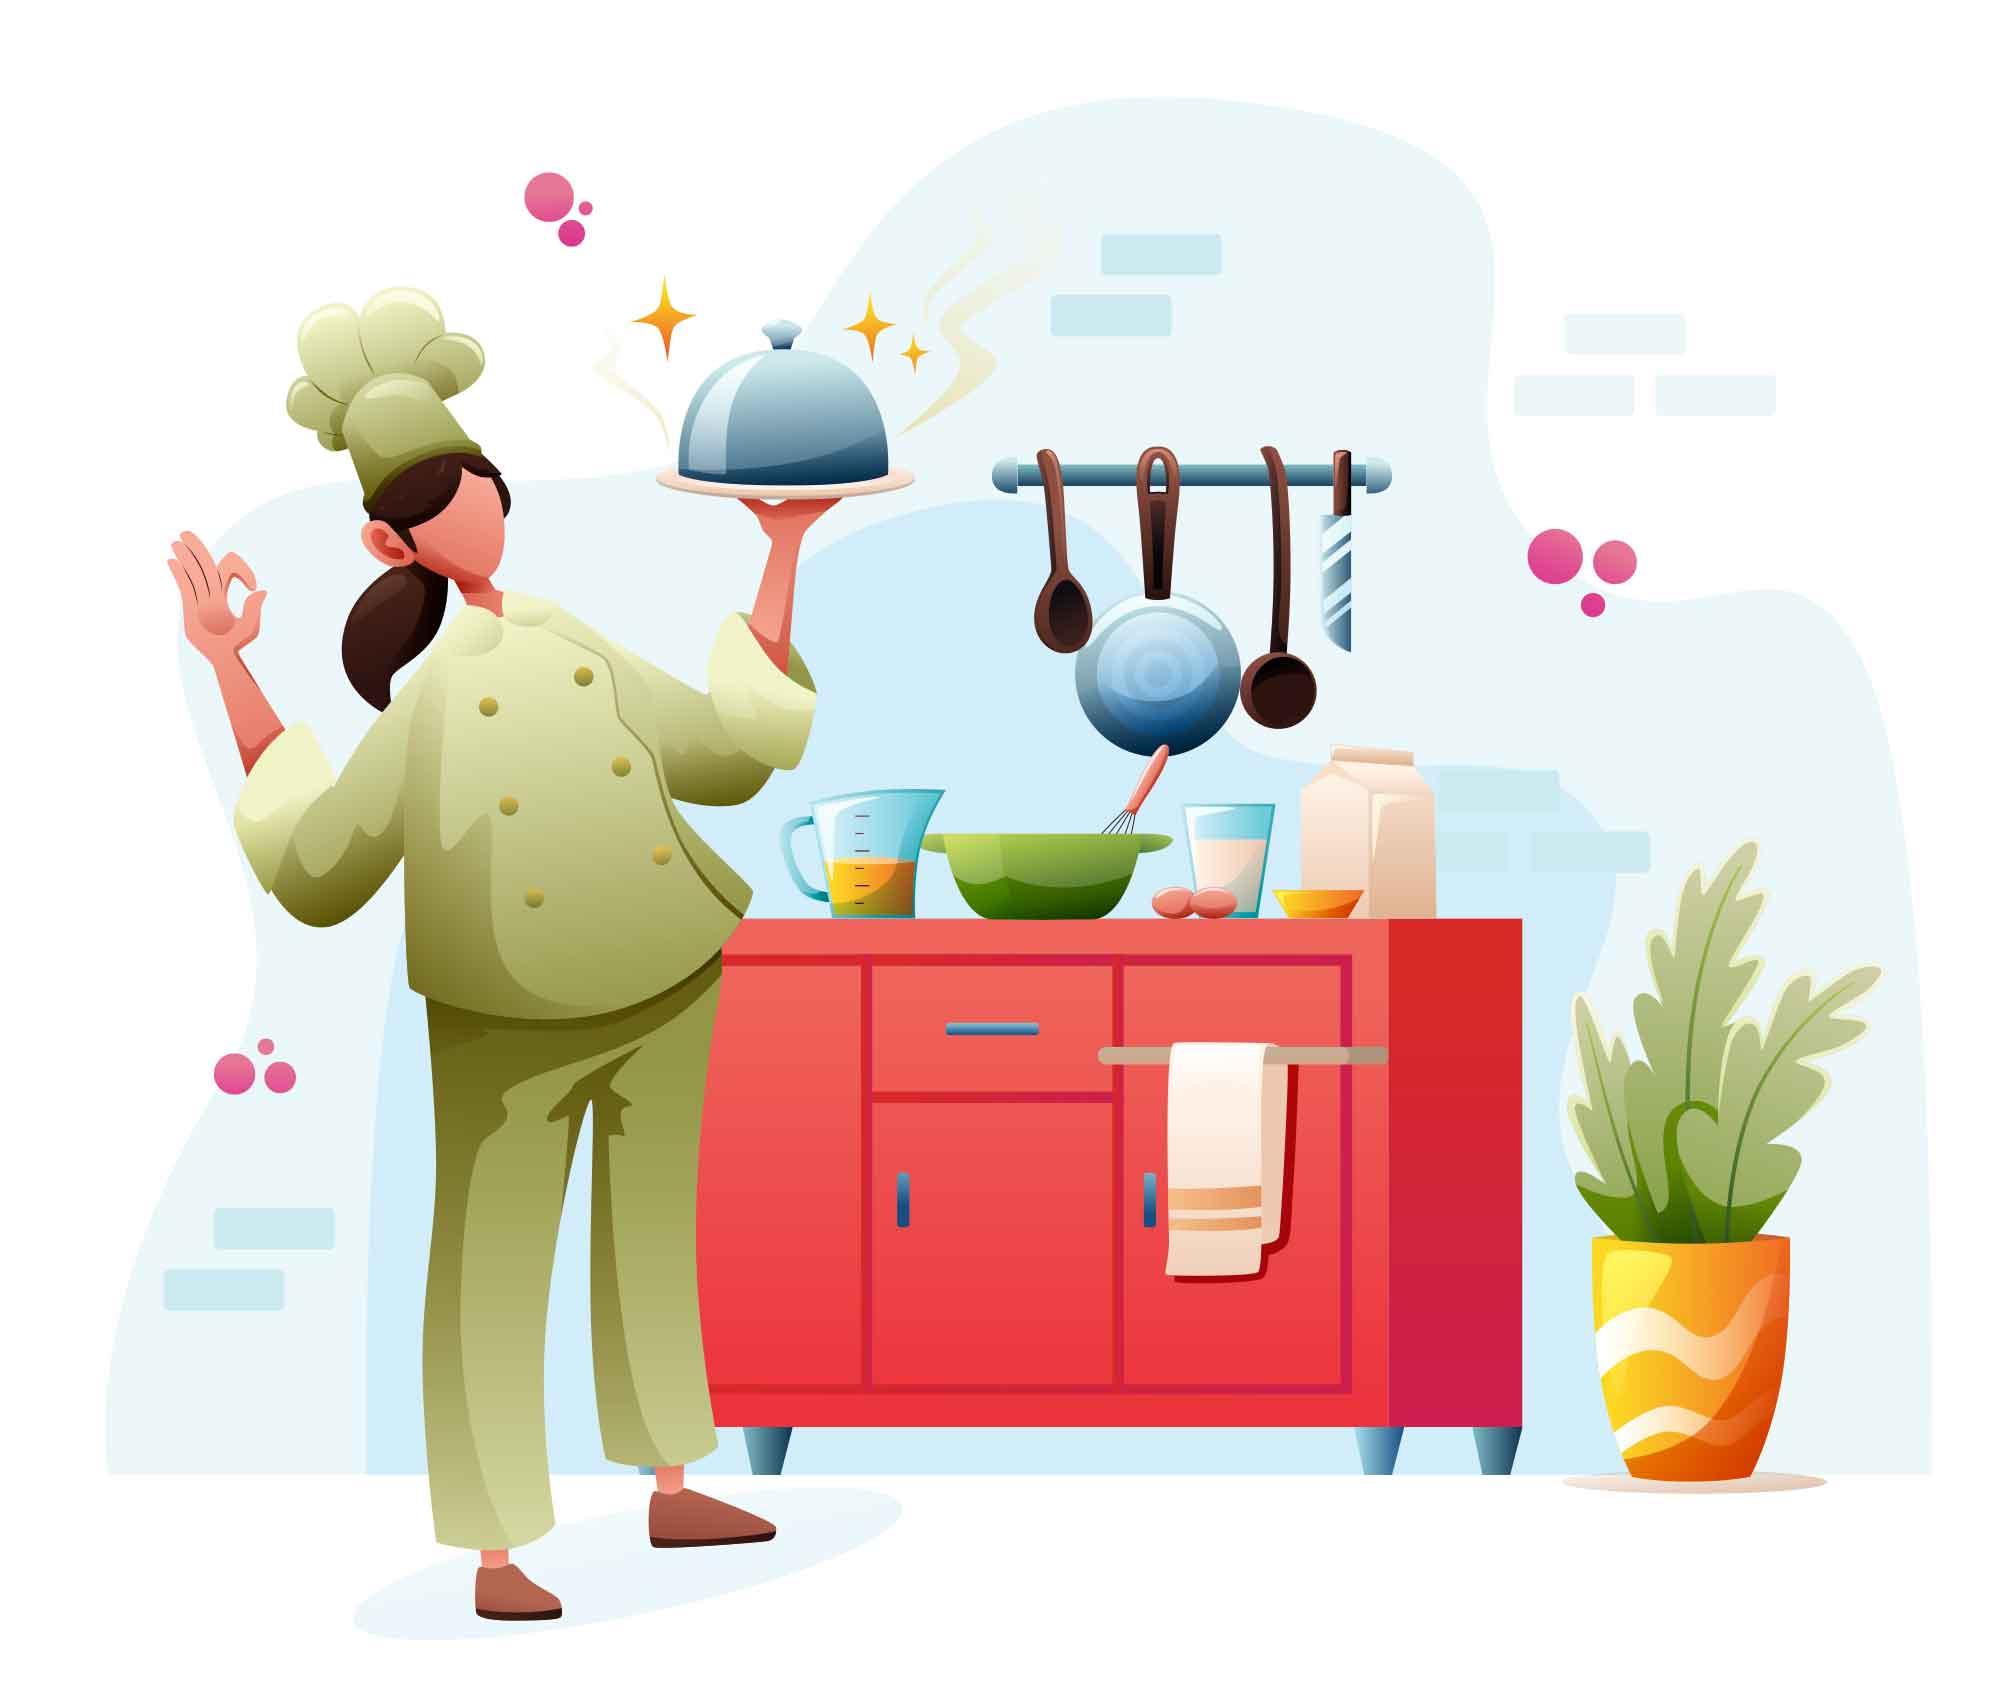 Woman Chef in Kitchen Illustration